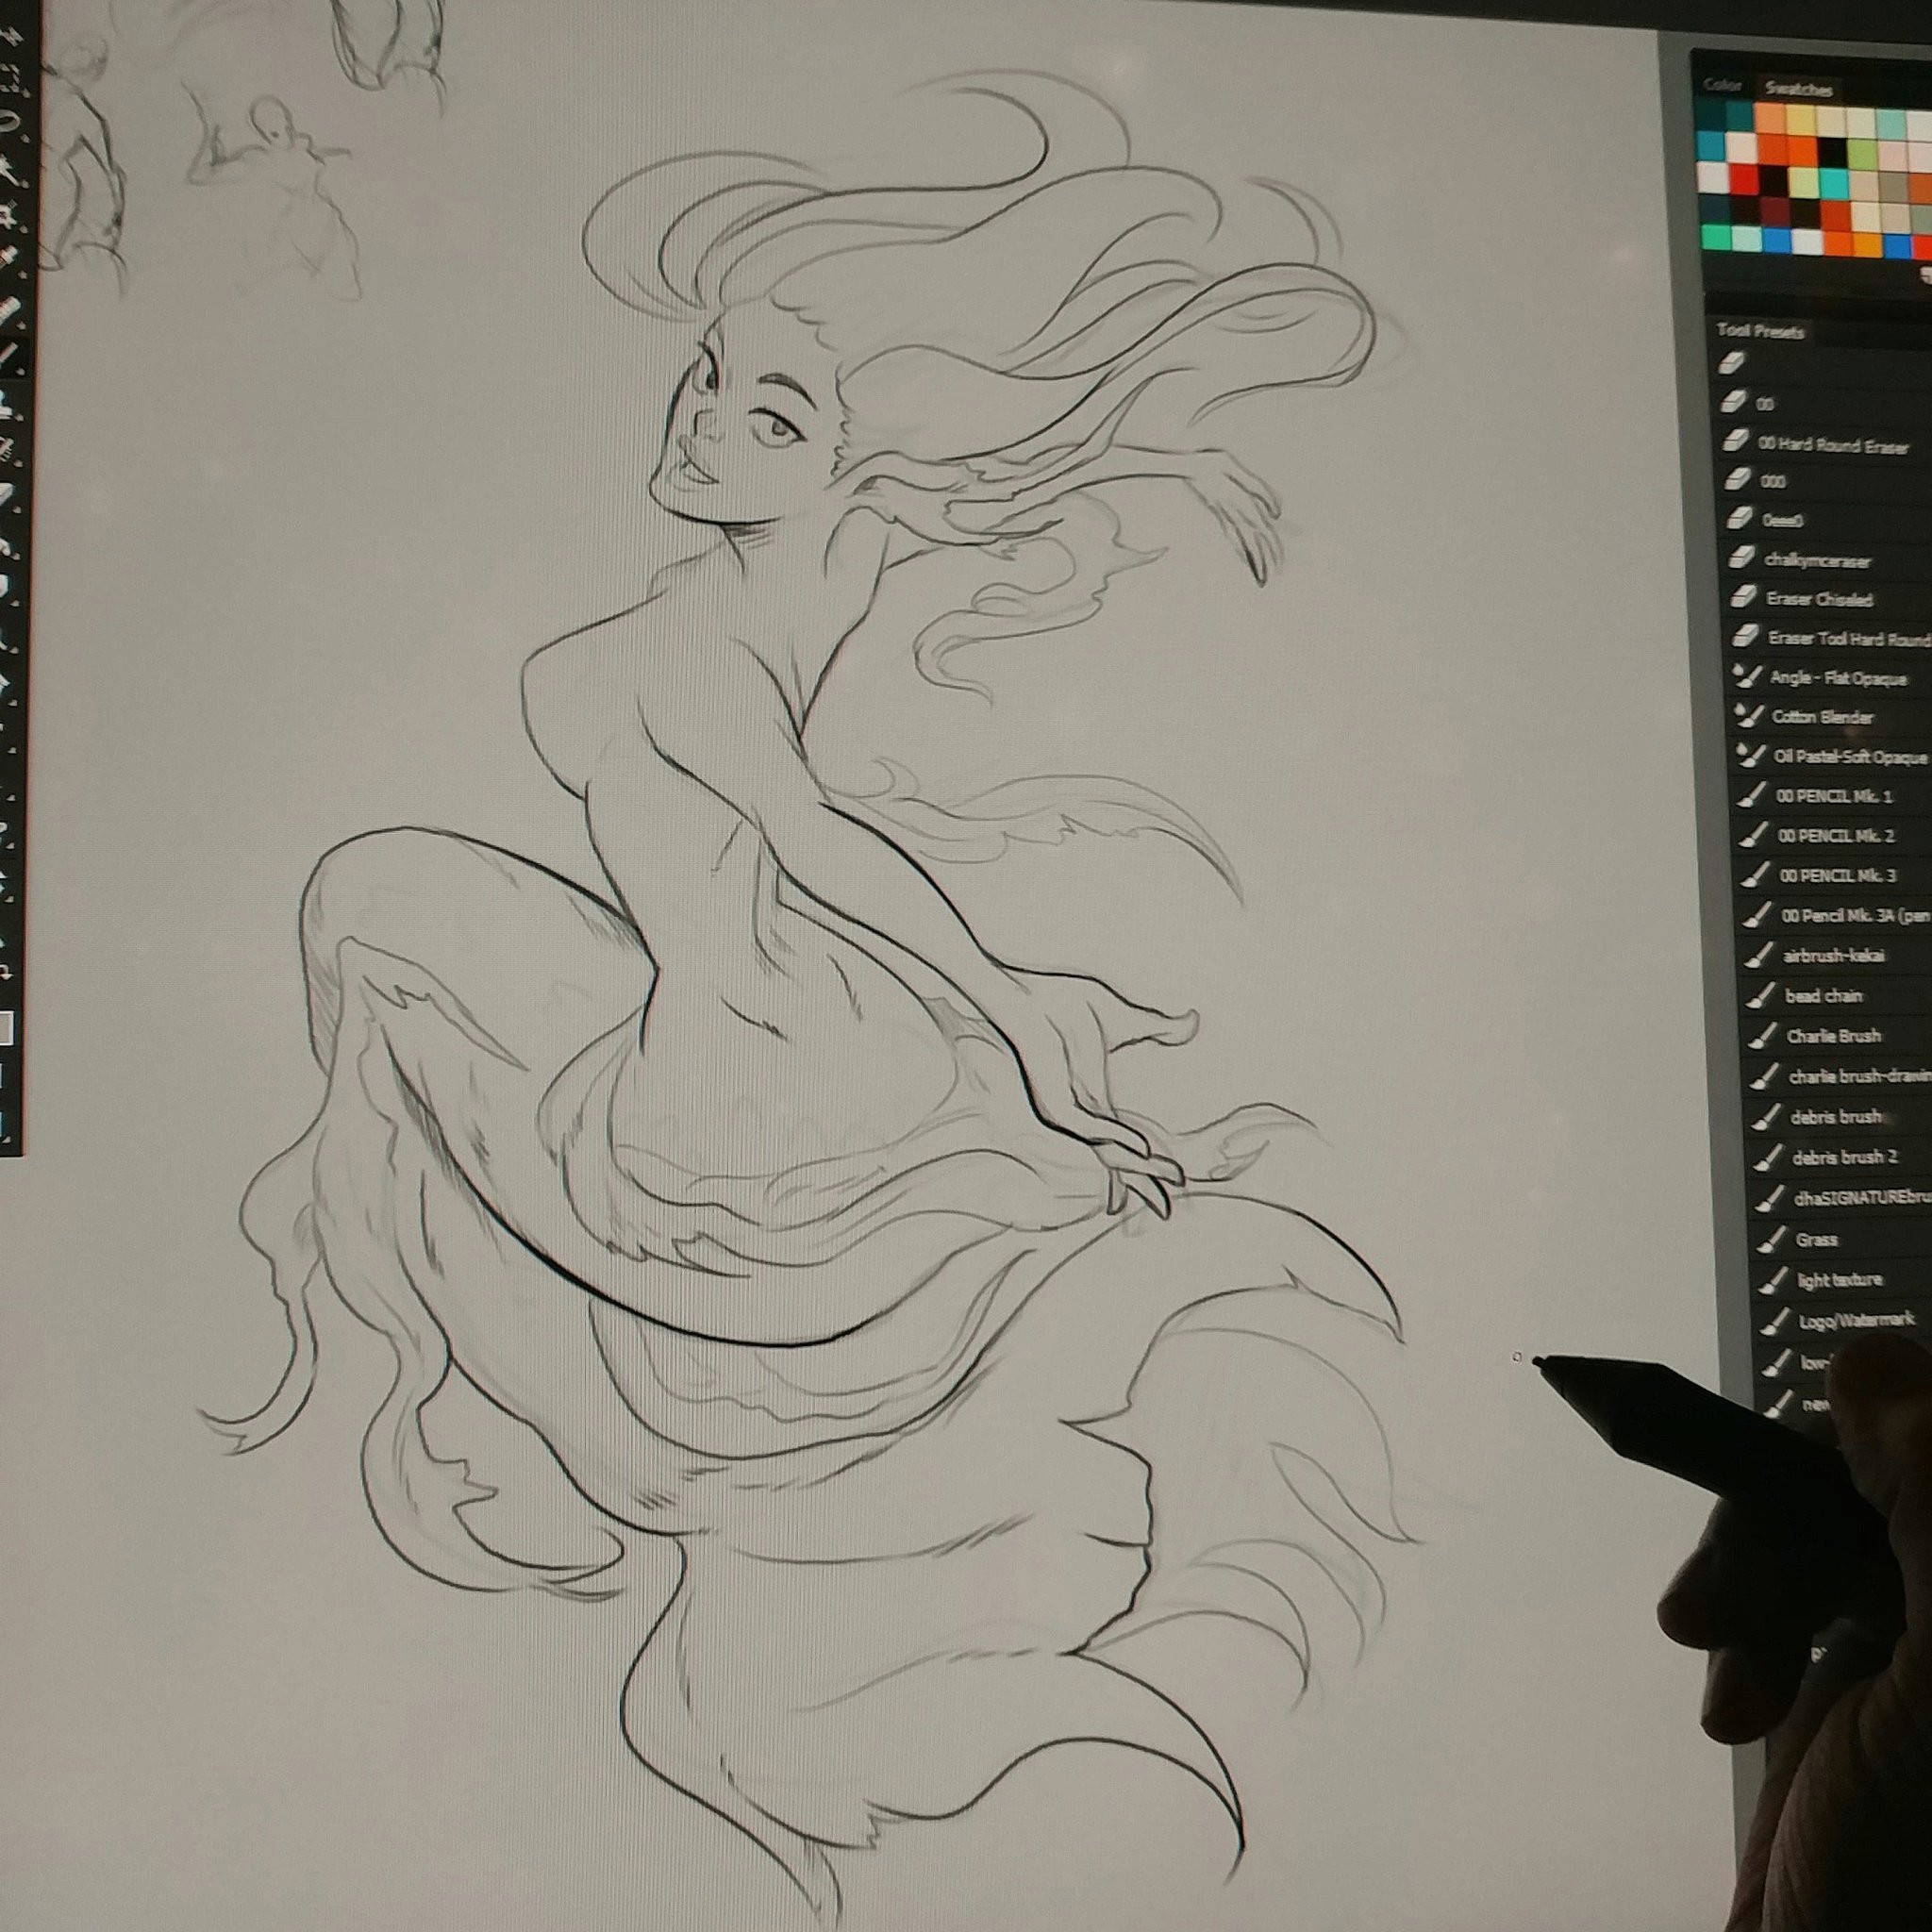 danhowardart on twitter this morning s mermay sketch drawing art cintiq madewithwacom